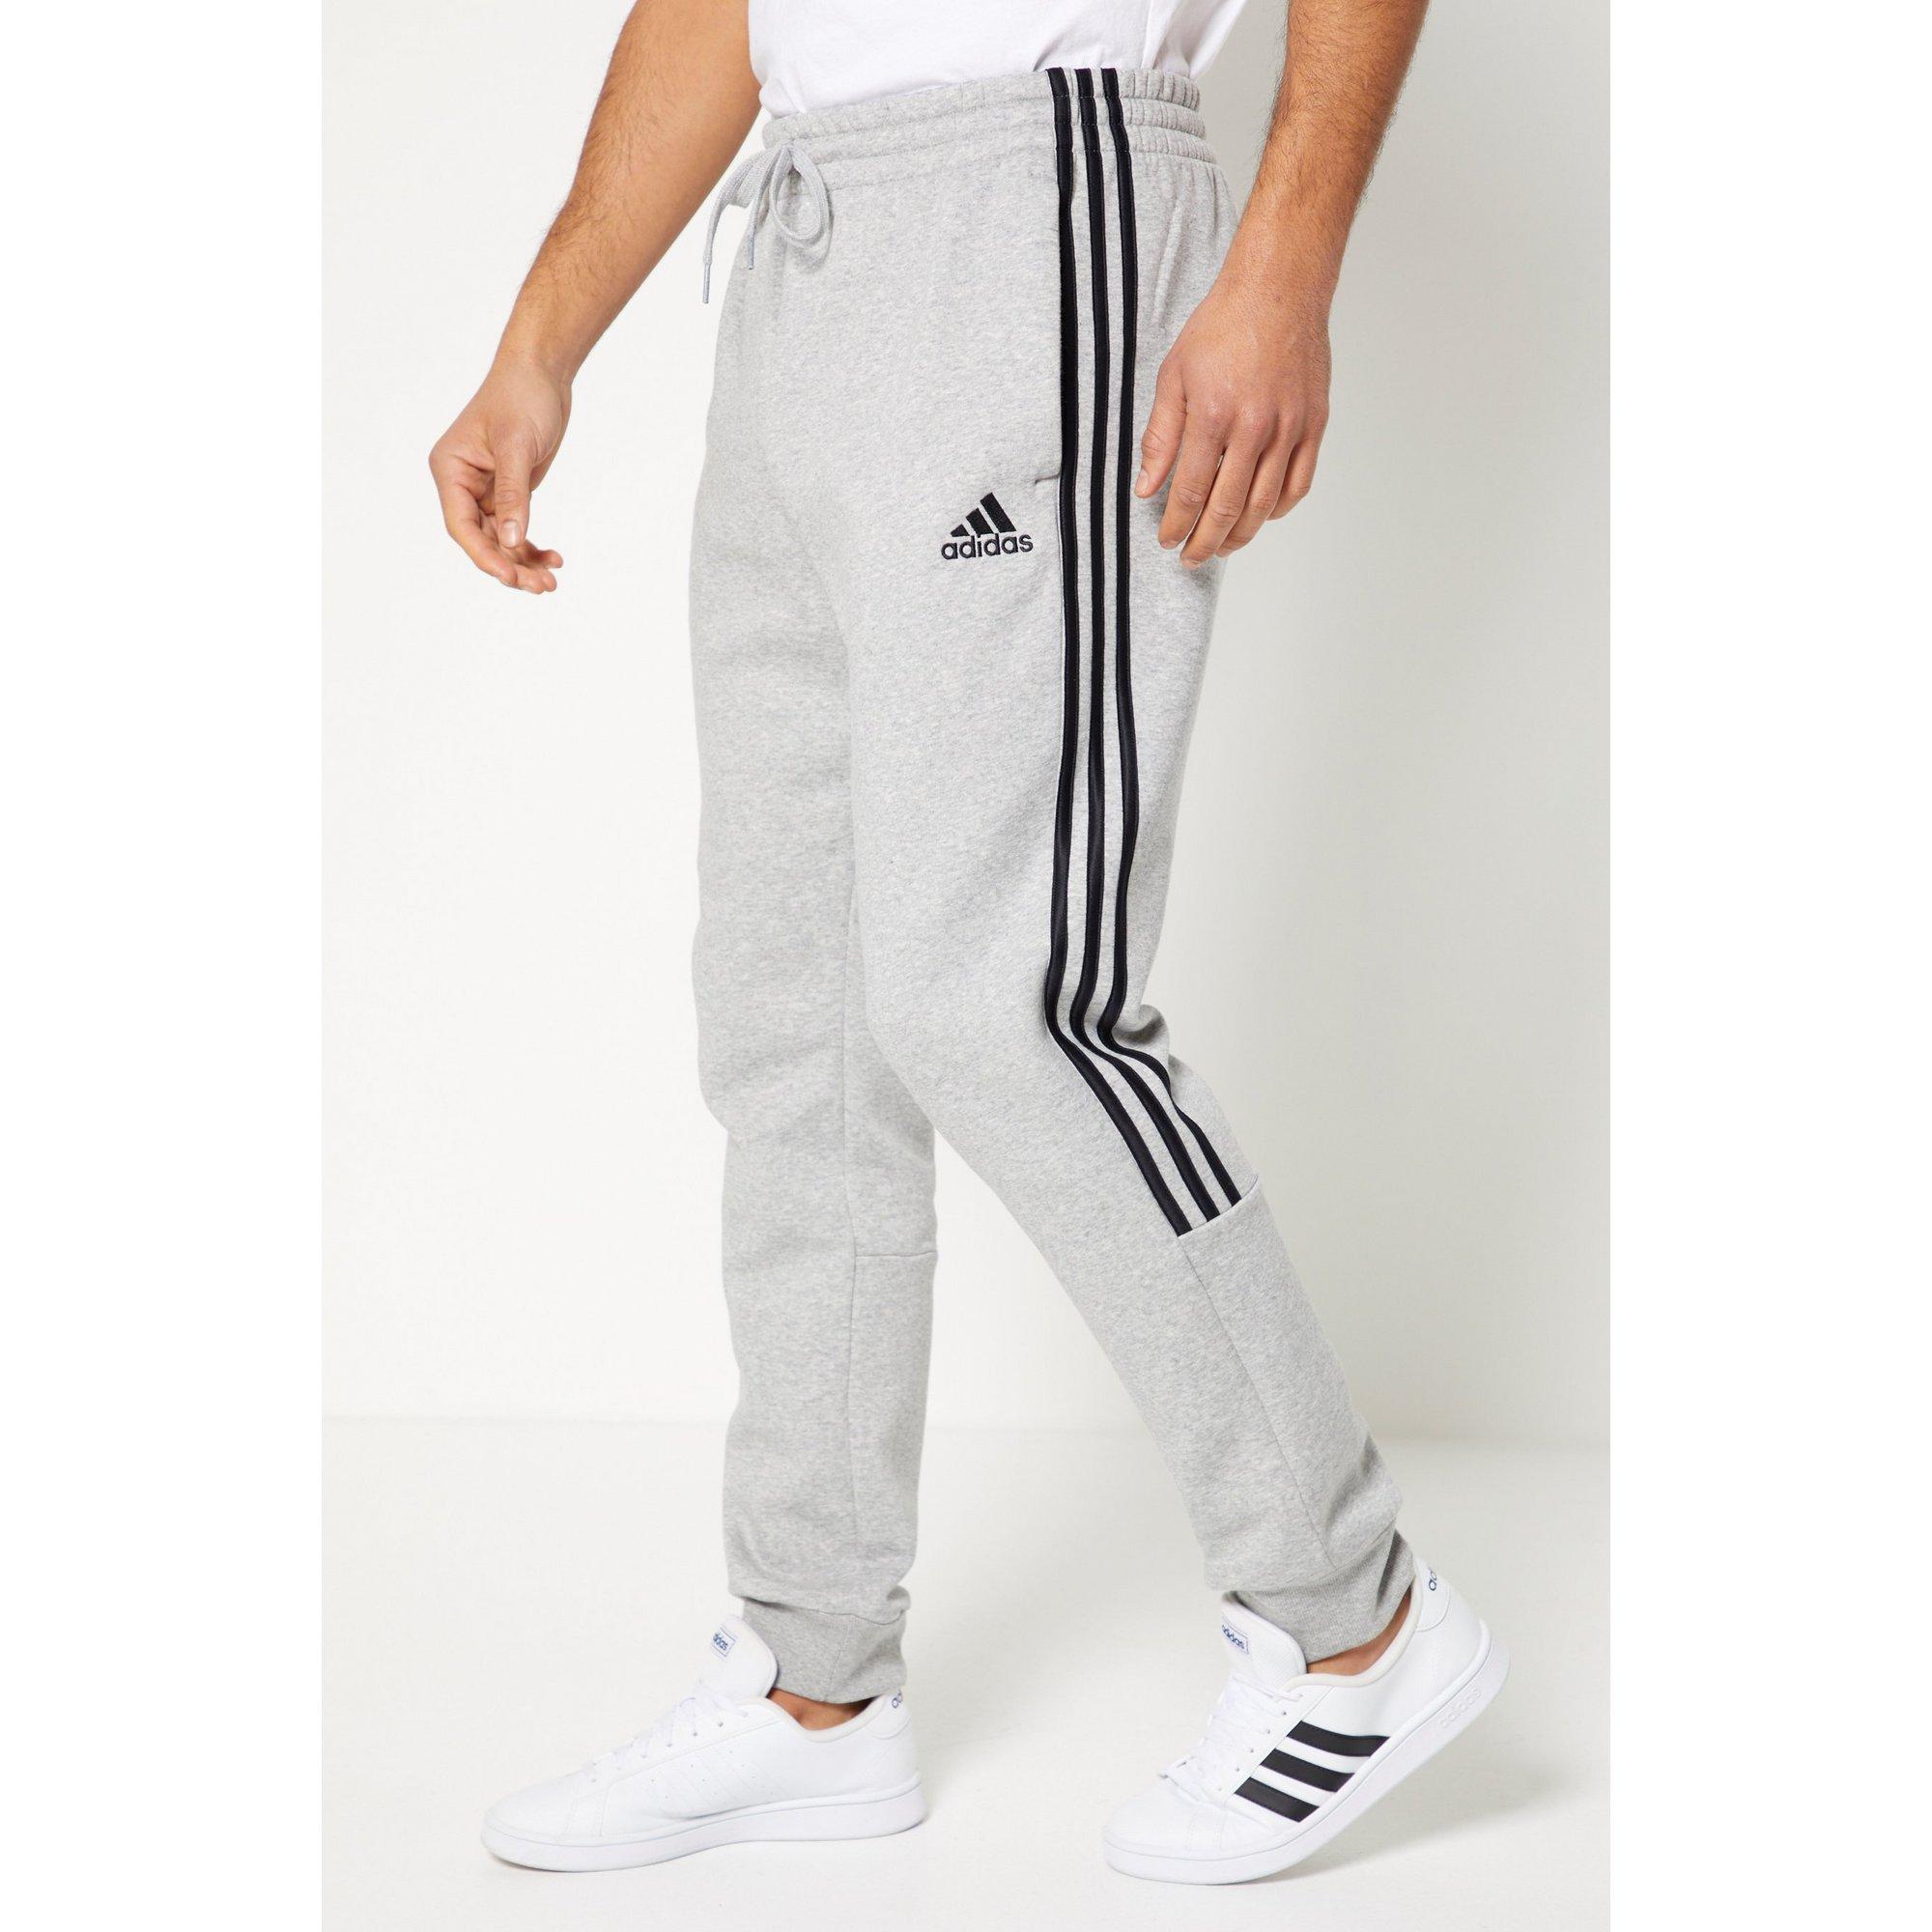 Image of adidas Essentials 3 Striped Cuffed Grey Joggers